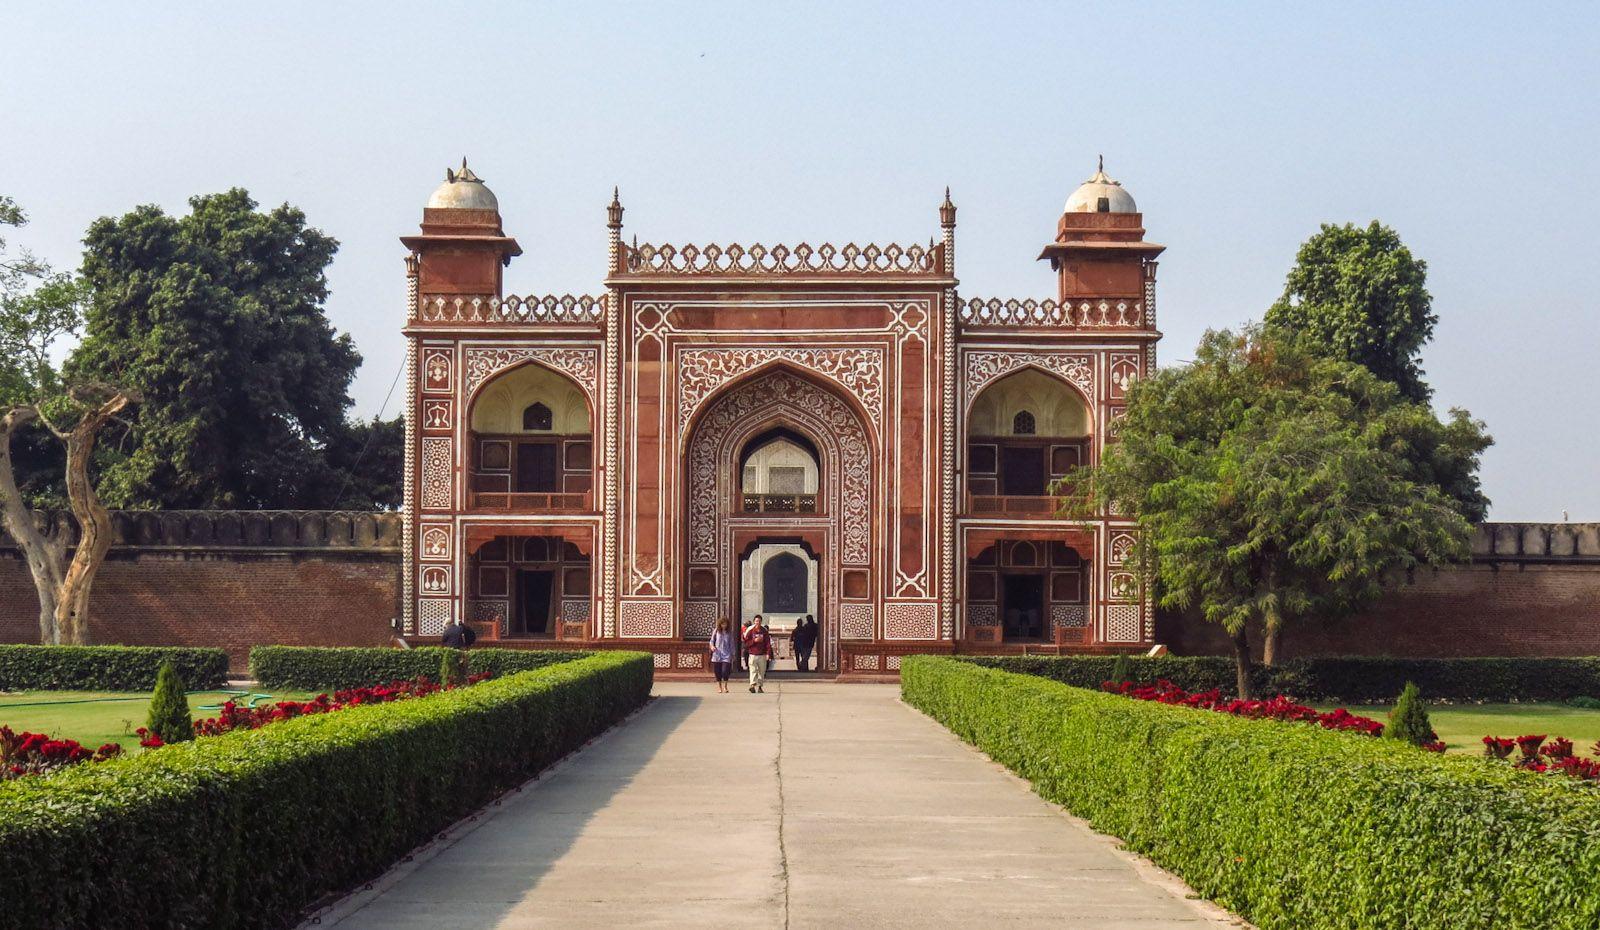 Rajasthan Car and Driver Agra Flashpacking Travel Blog